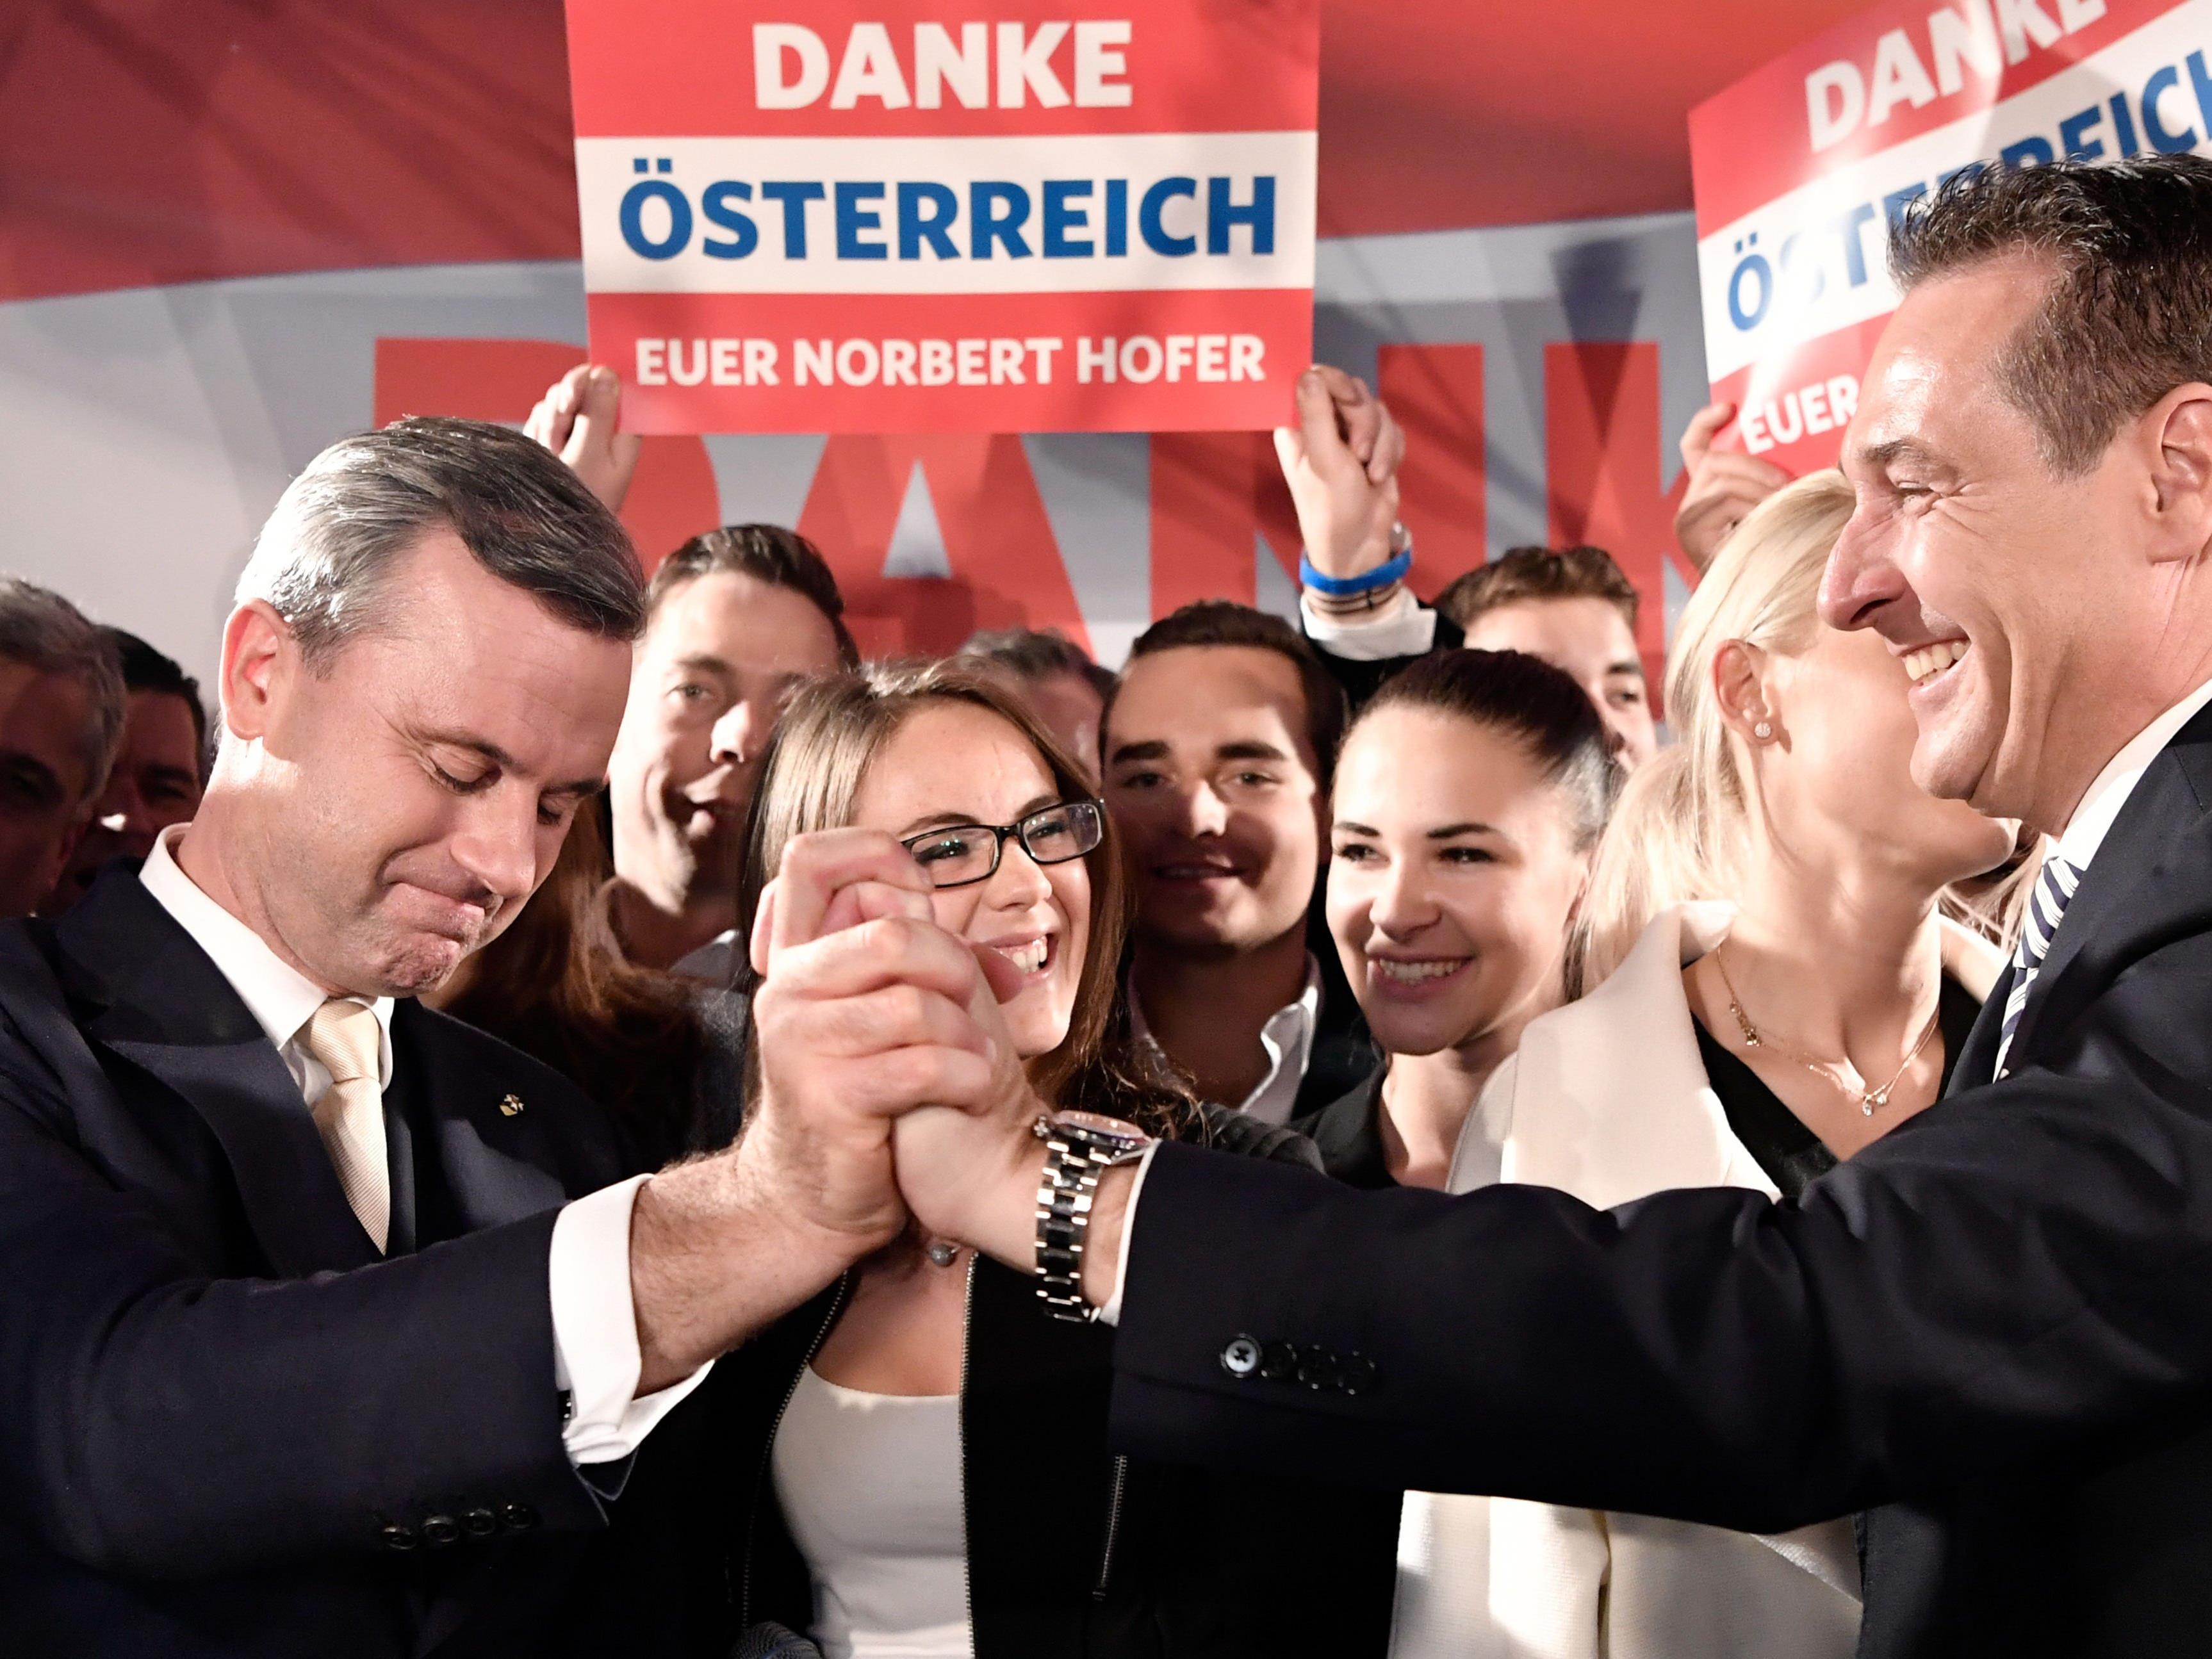 FPÖ-Präsidentschaftskandidat Norbert Hofer (l.) und FPÖ-Chef Heinz Christian Strache (r.)